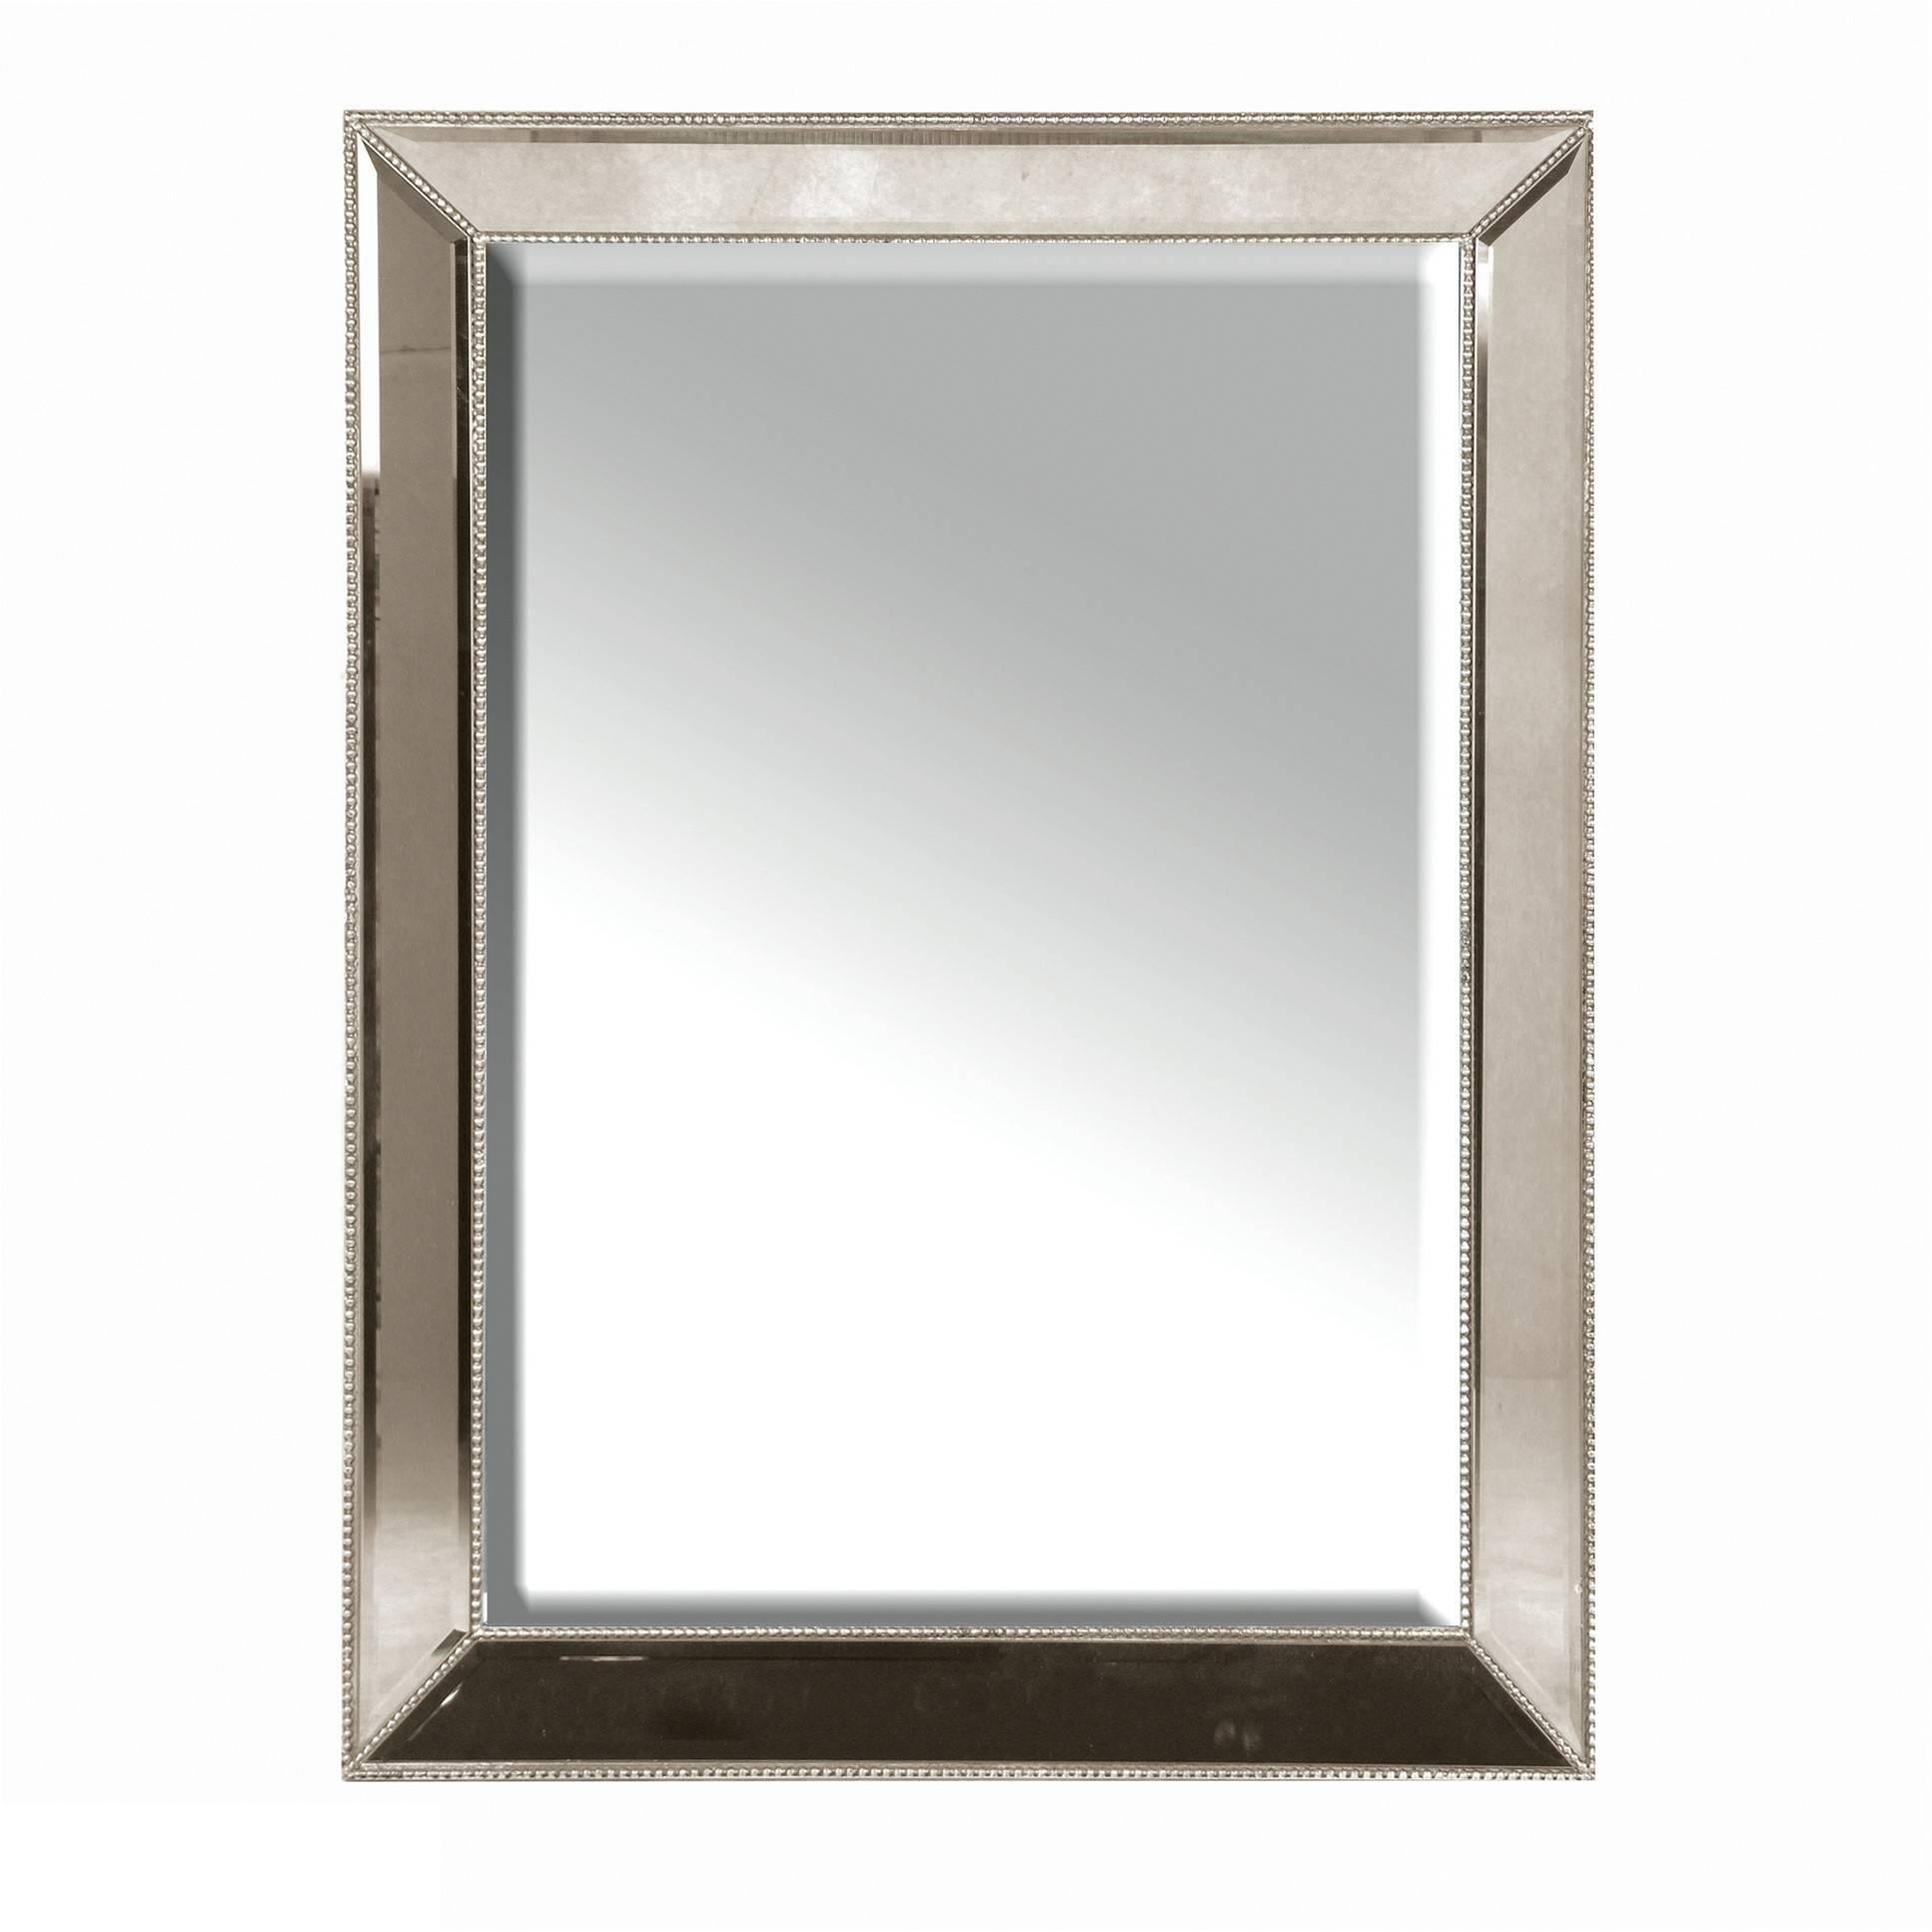 Interior: Vintage Venetian Mirror For Classic Interior Decor Inside Venetian Style Mirrors (View 4 of 15)